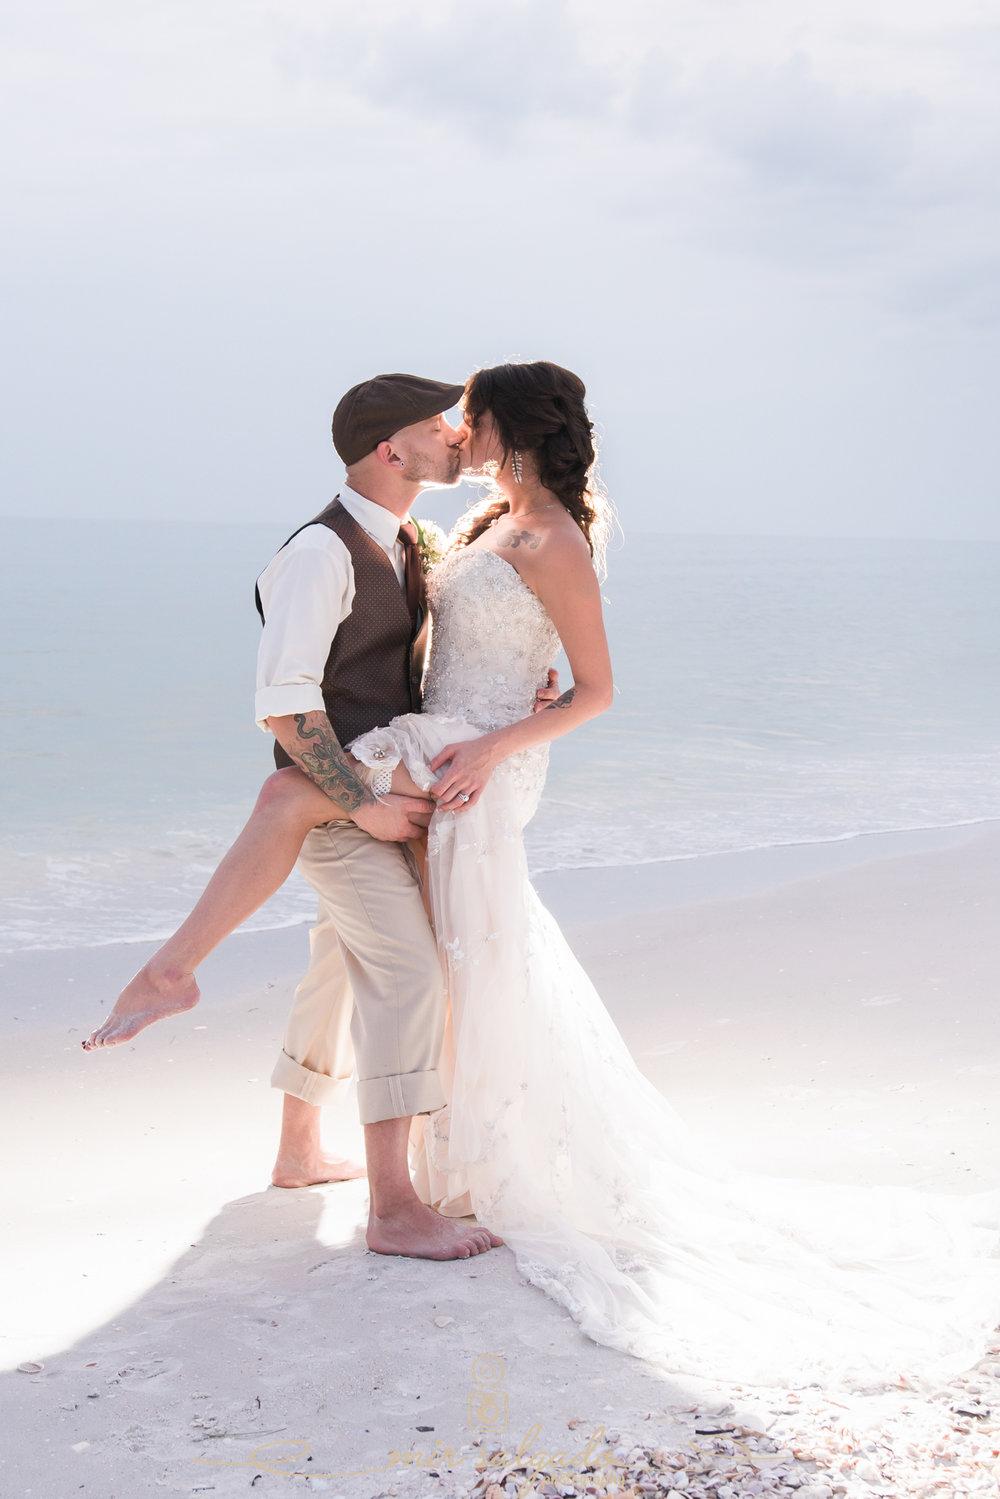 sexy-beach-wedding-photo, bride-and-groom-beach-photo